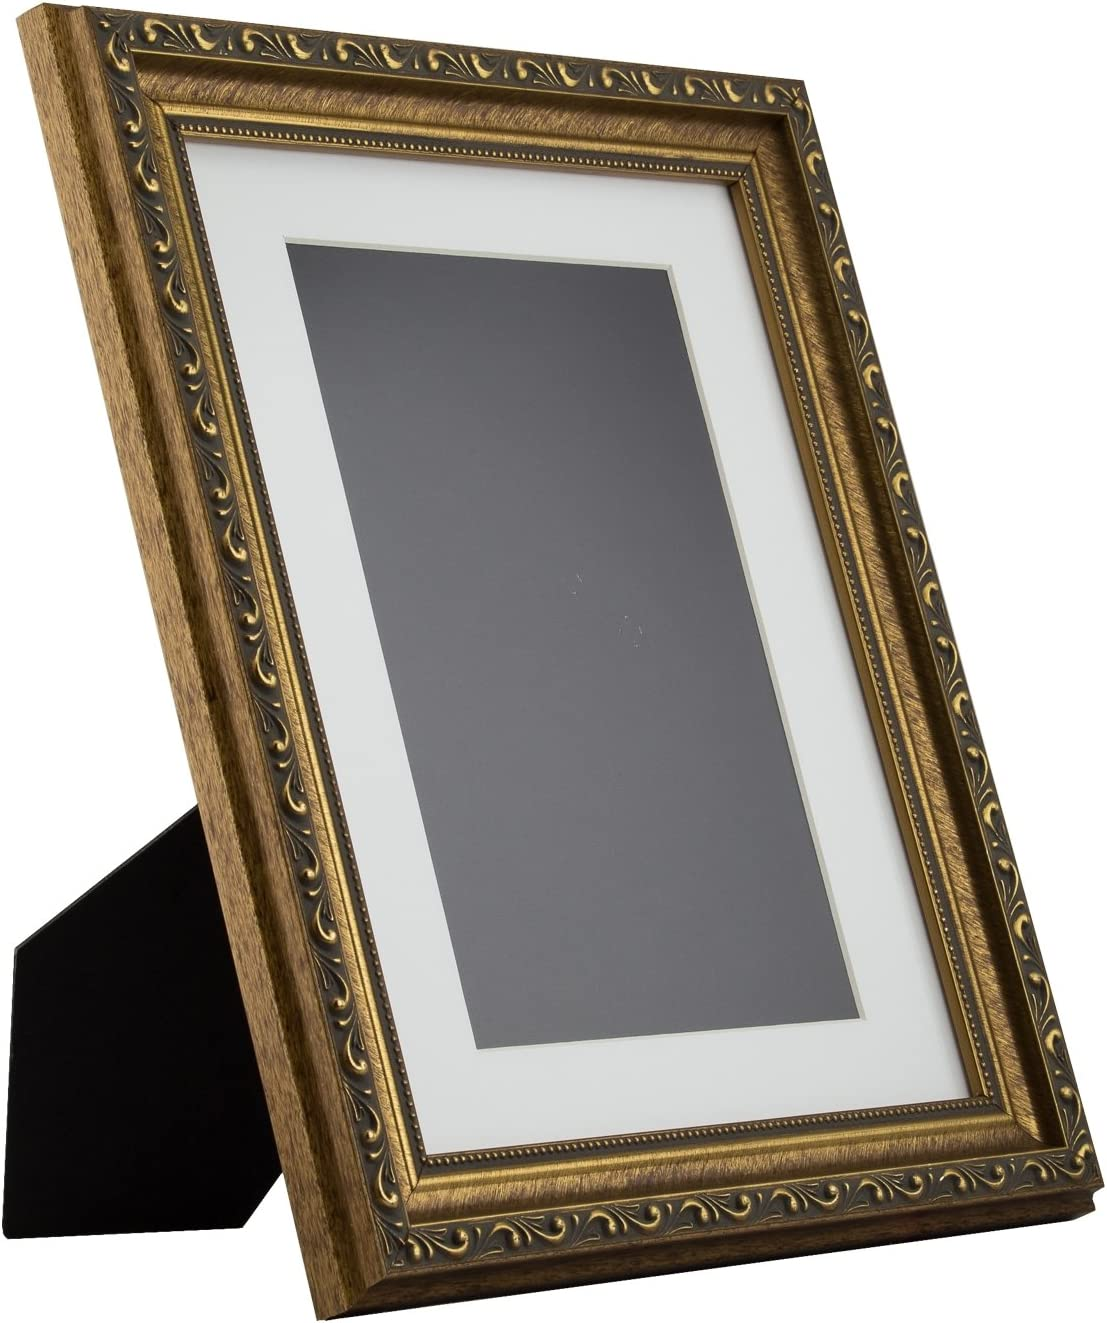 Regence Craig Frames 94870810 8x10 Inch Amber and Gold Ornate Picture Frame